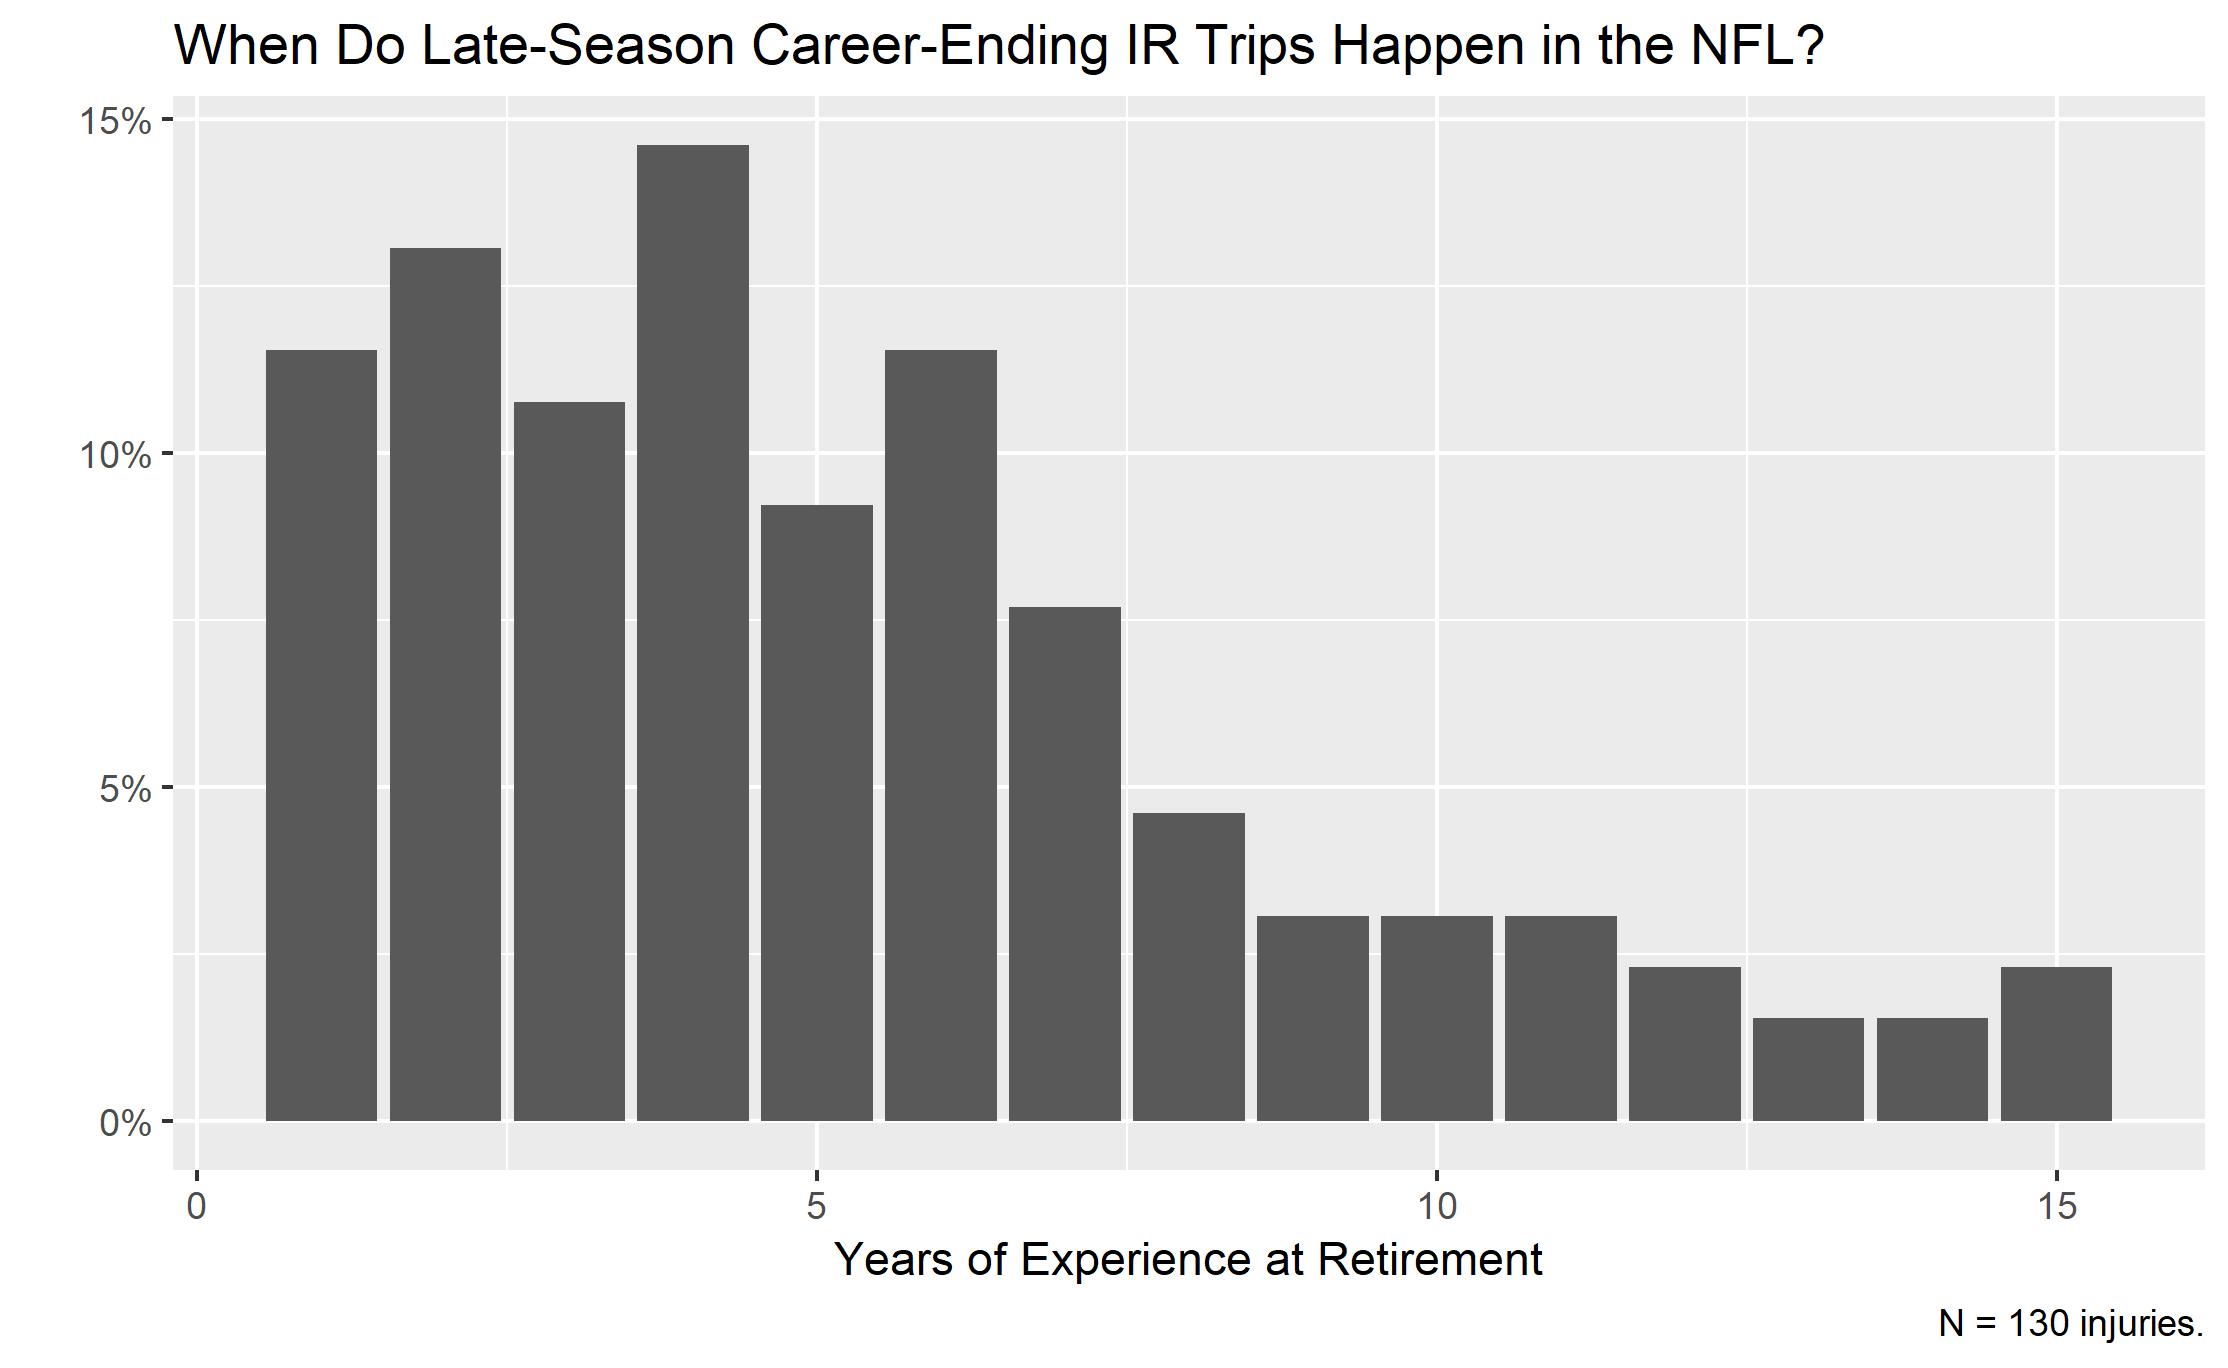 Year of late-season IR injuries